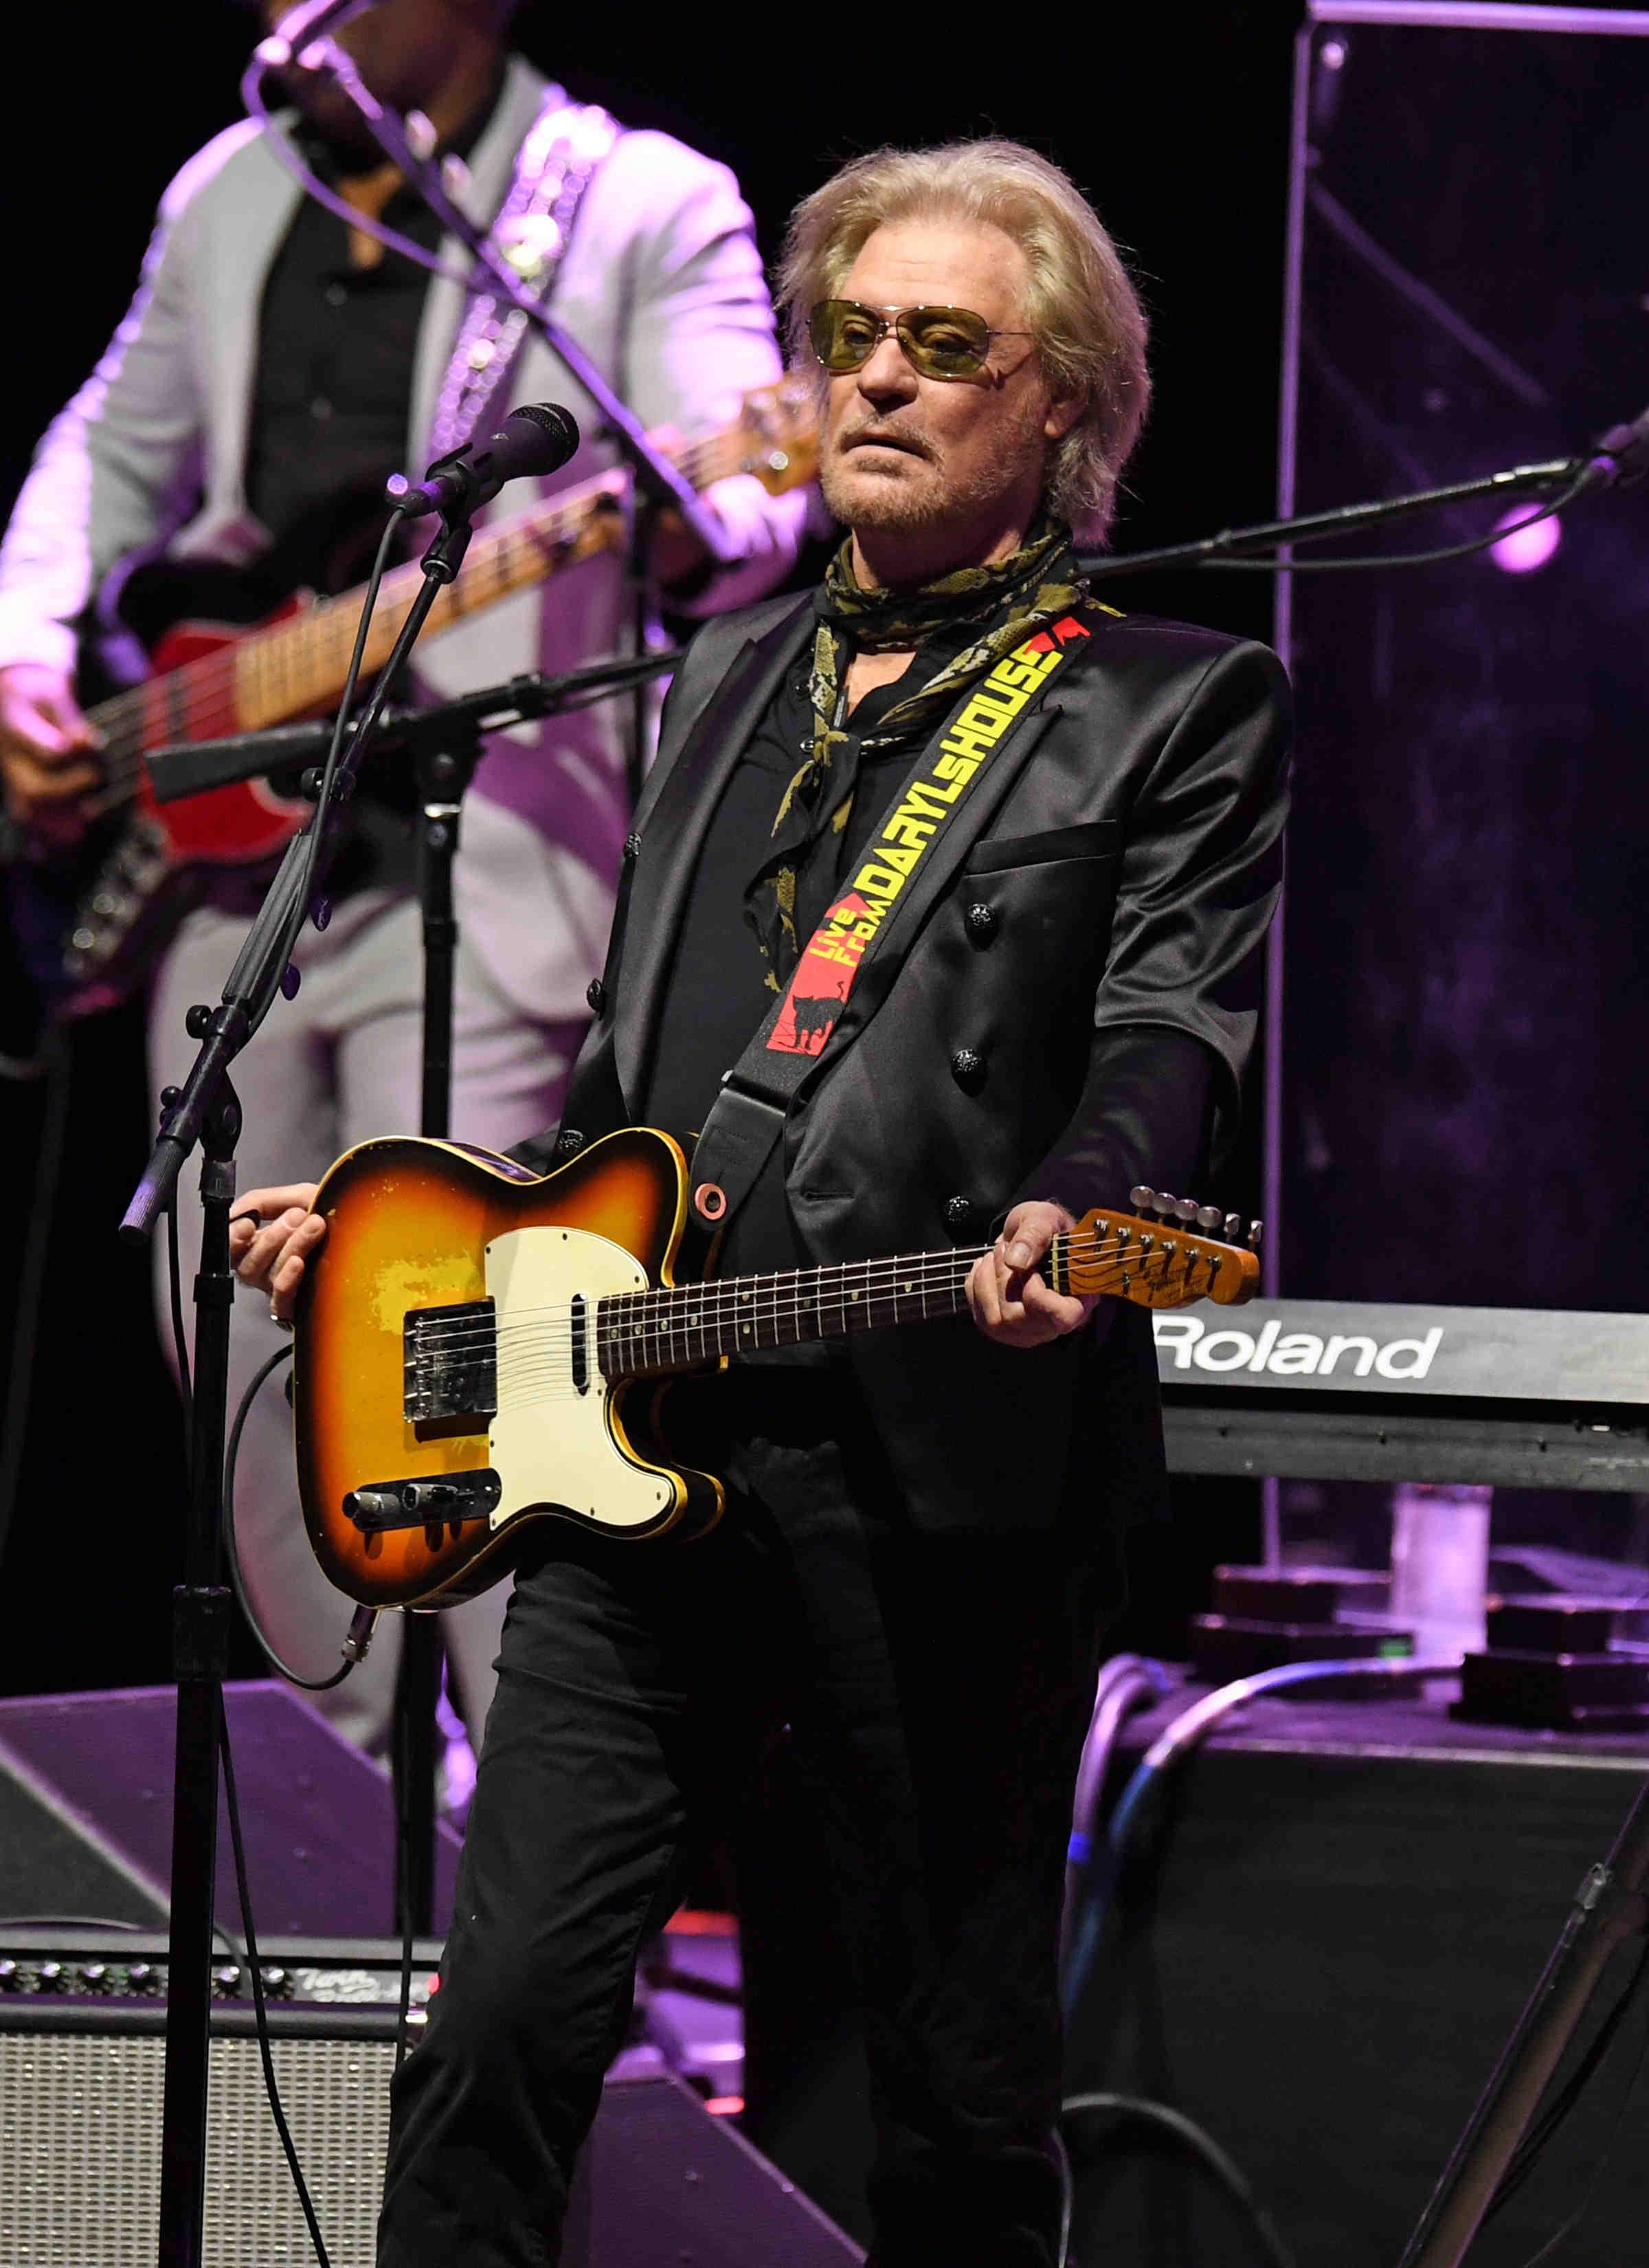 Daryl Hall in concert - Seminole Hard Rock Hotel & Casino.